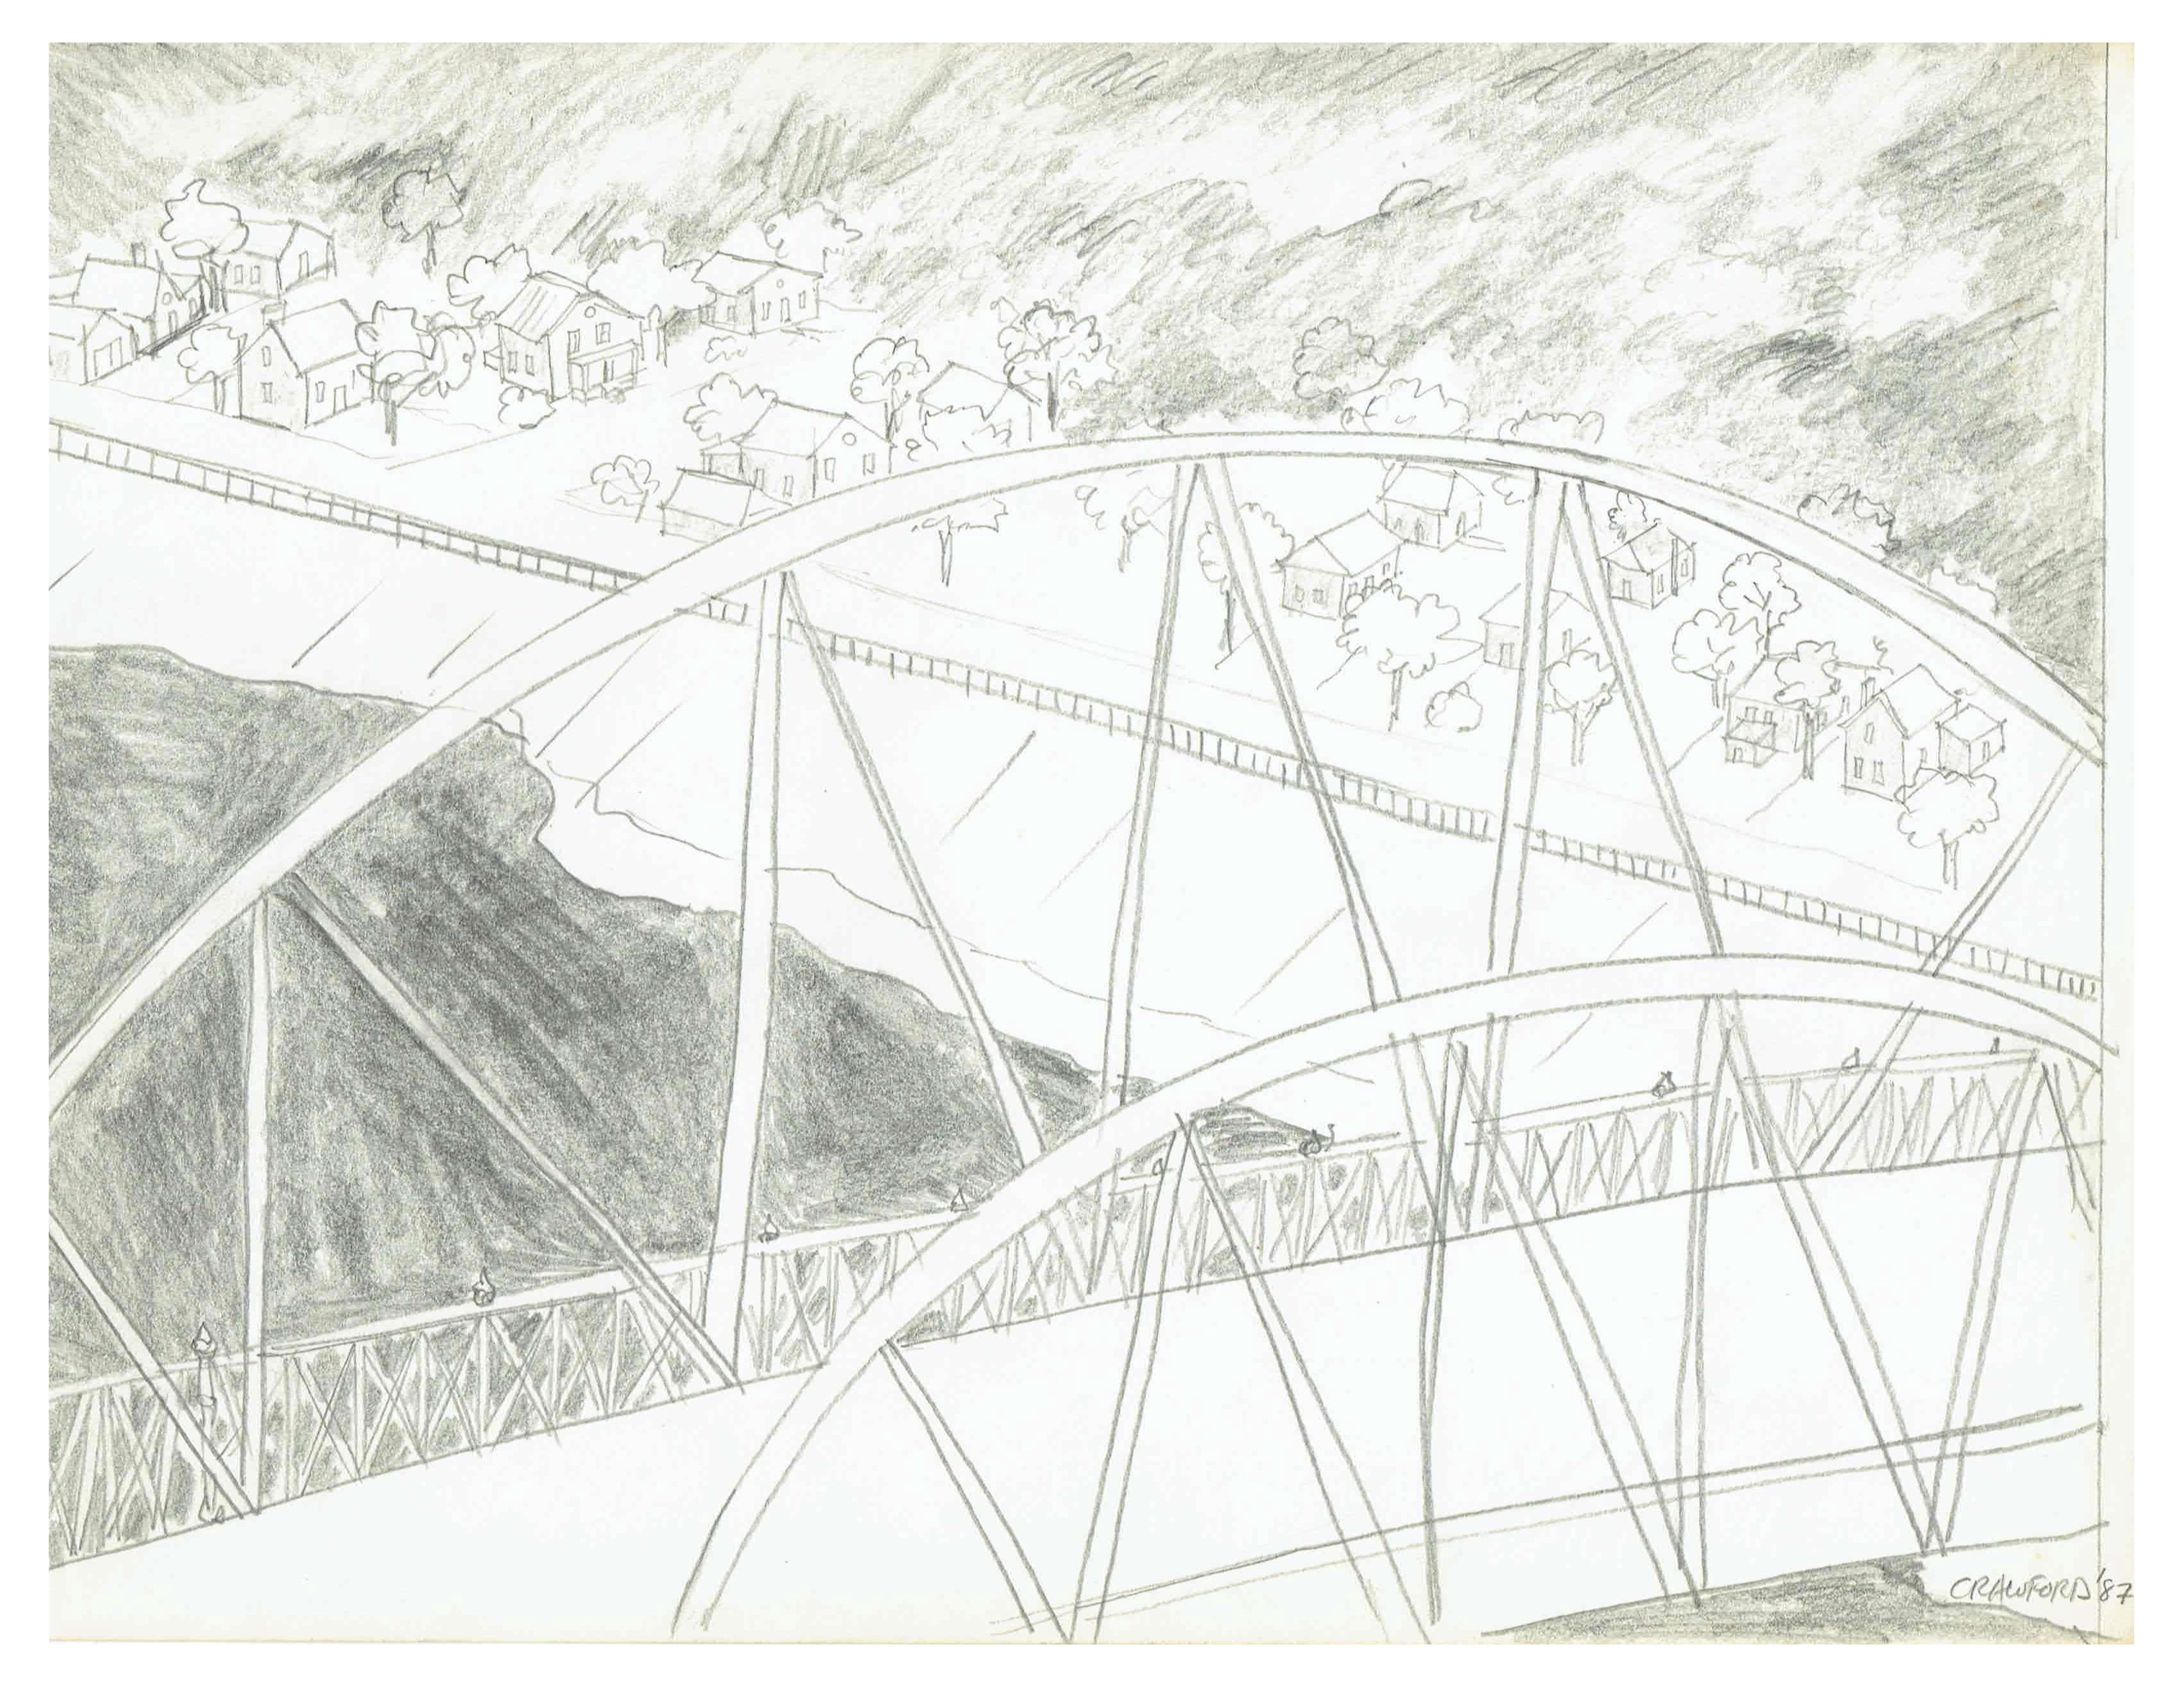 Blackfriars bridge, July 11, 1987, pencil on paper, 29 cm x 21.3 cm